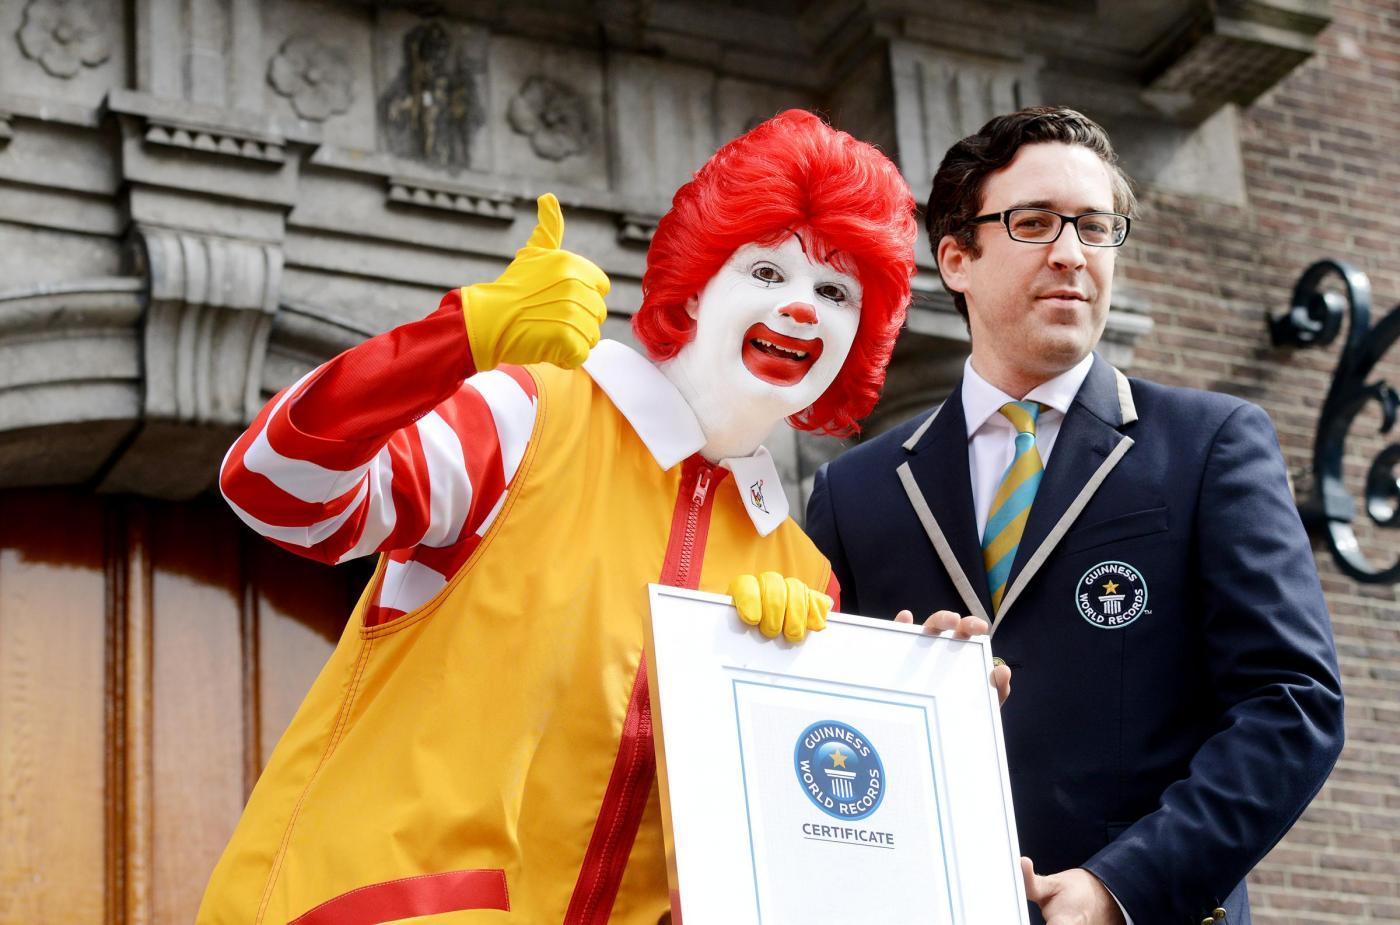 Ronald McDonald, Jack Brockbank